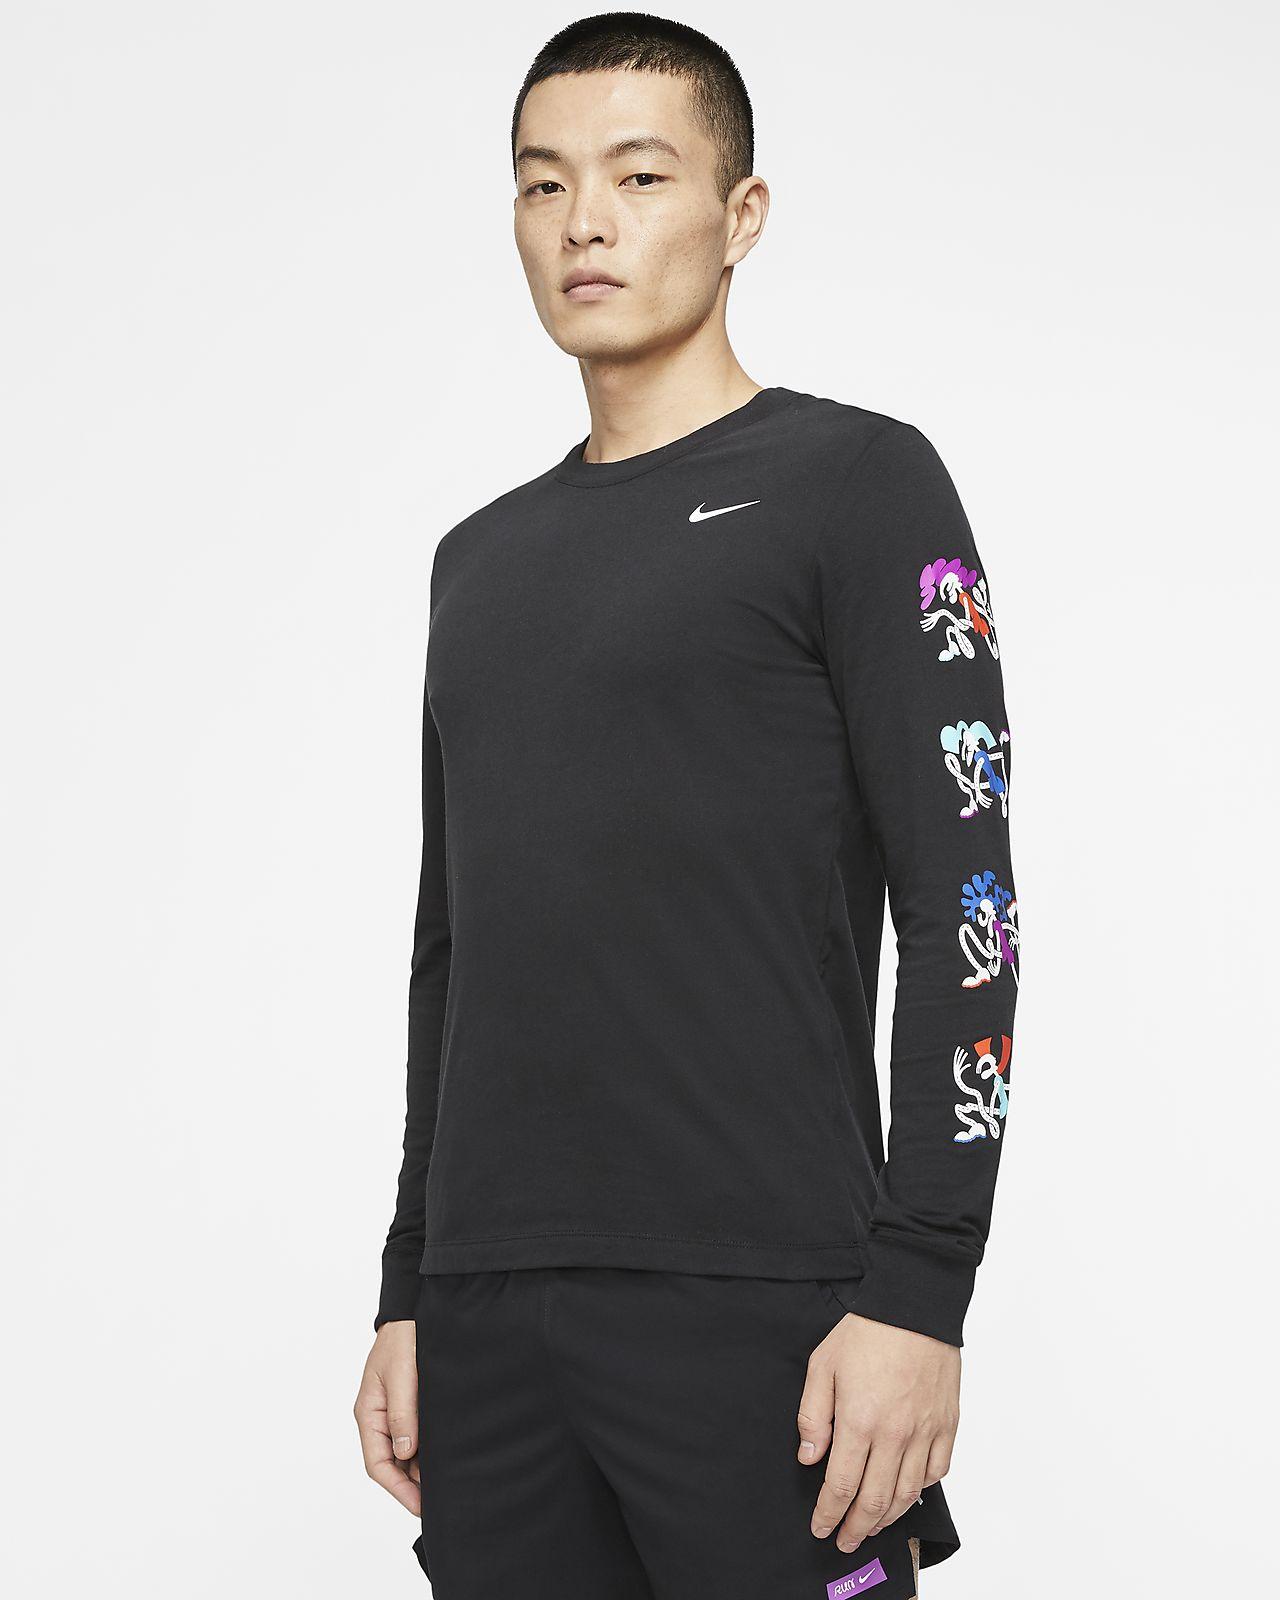 Nike Dri FIT Men's Long Sleeve T Shirt